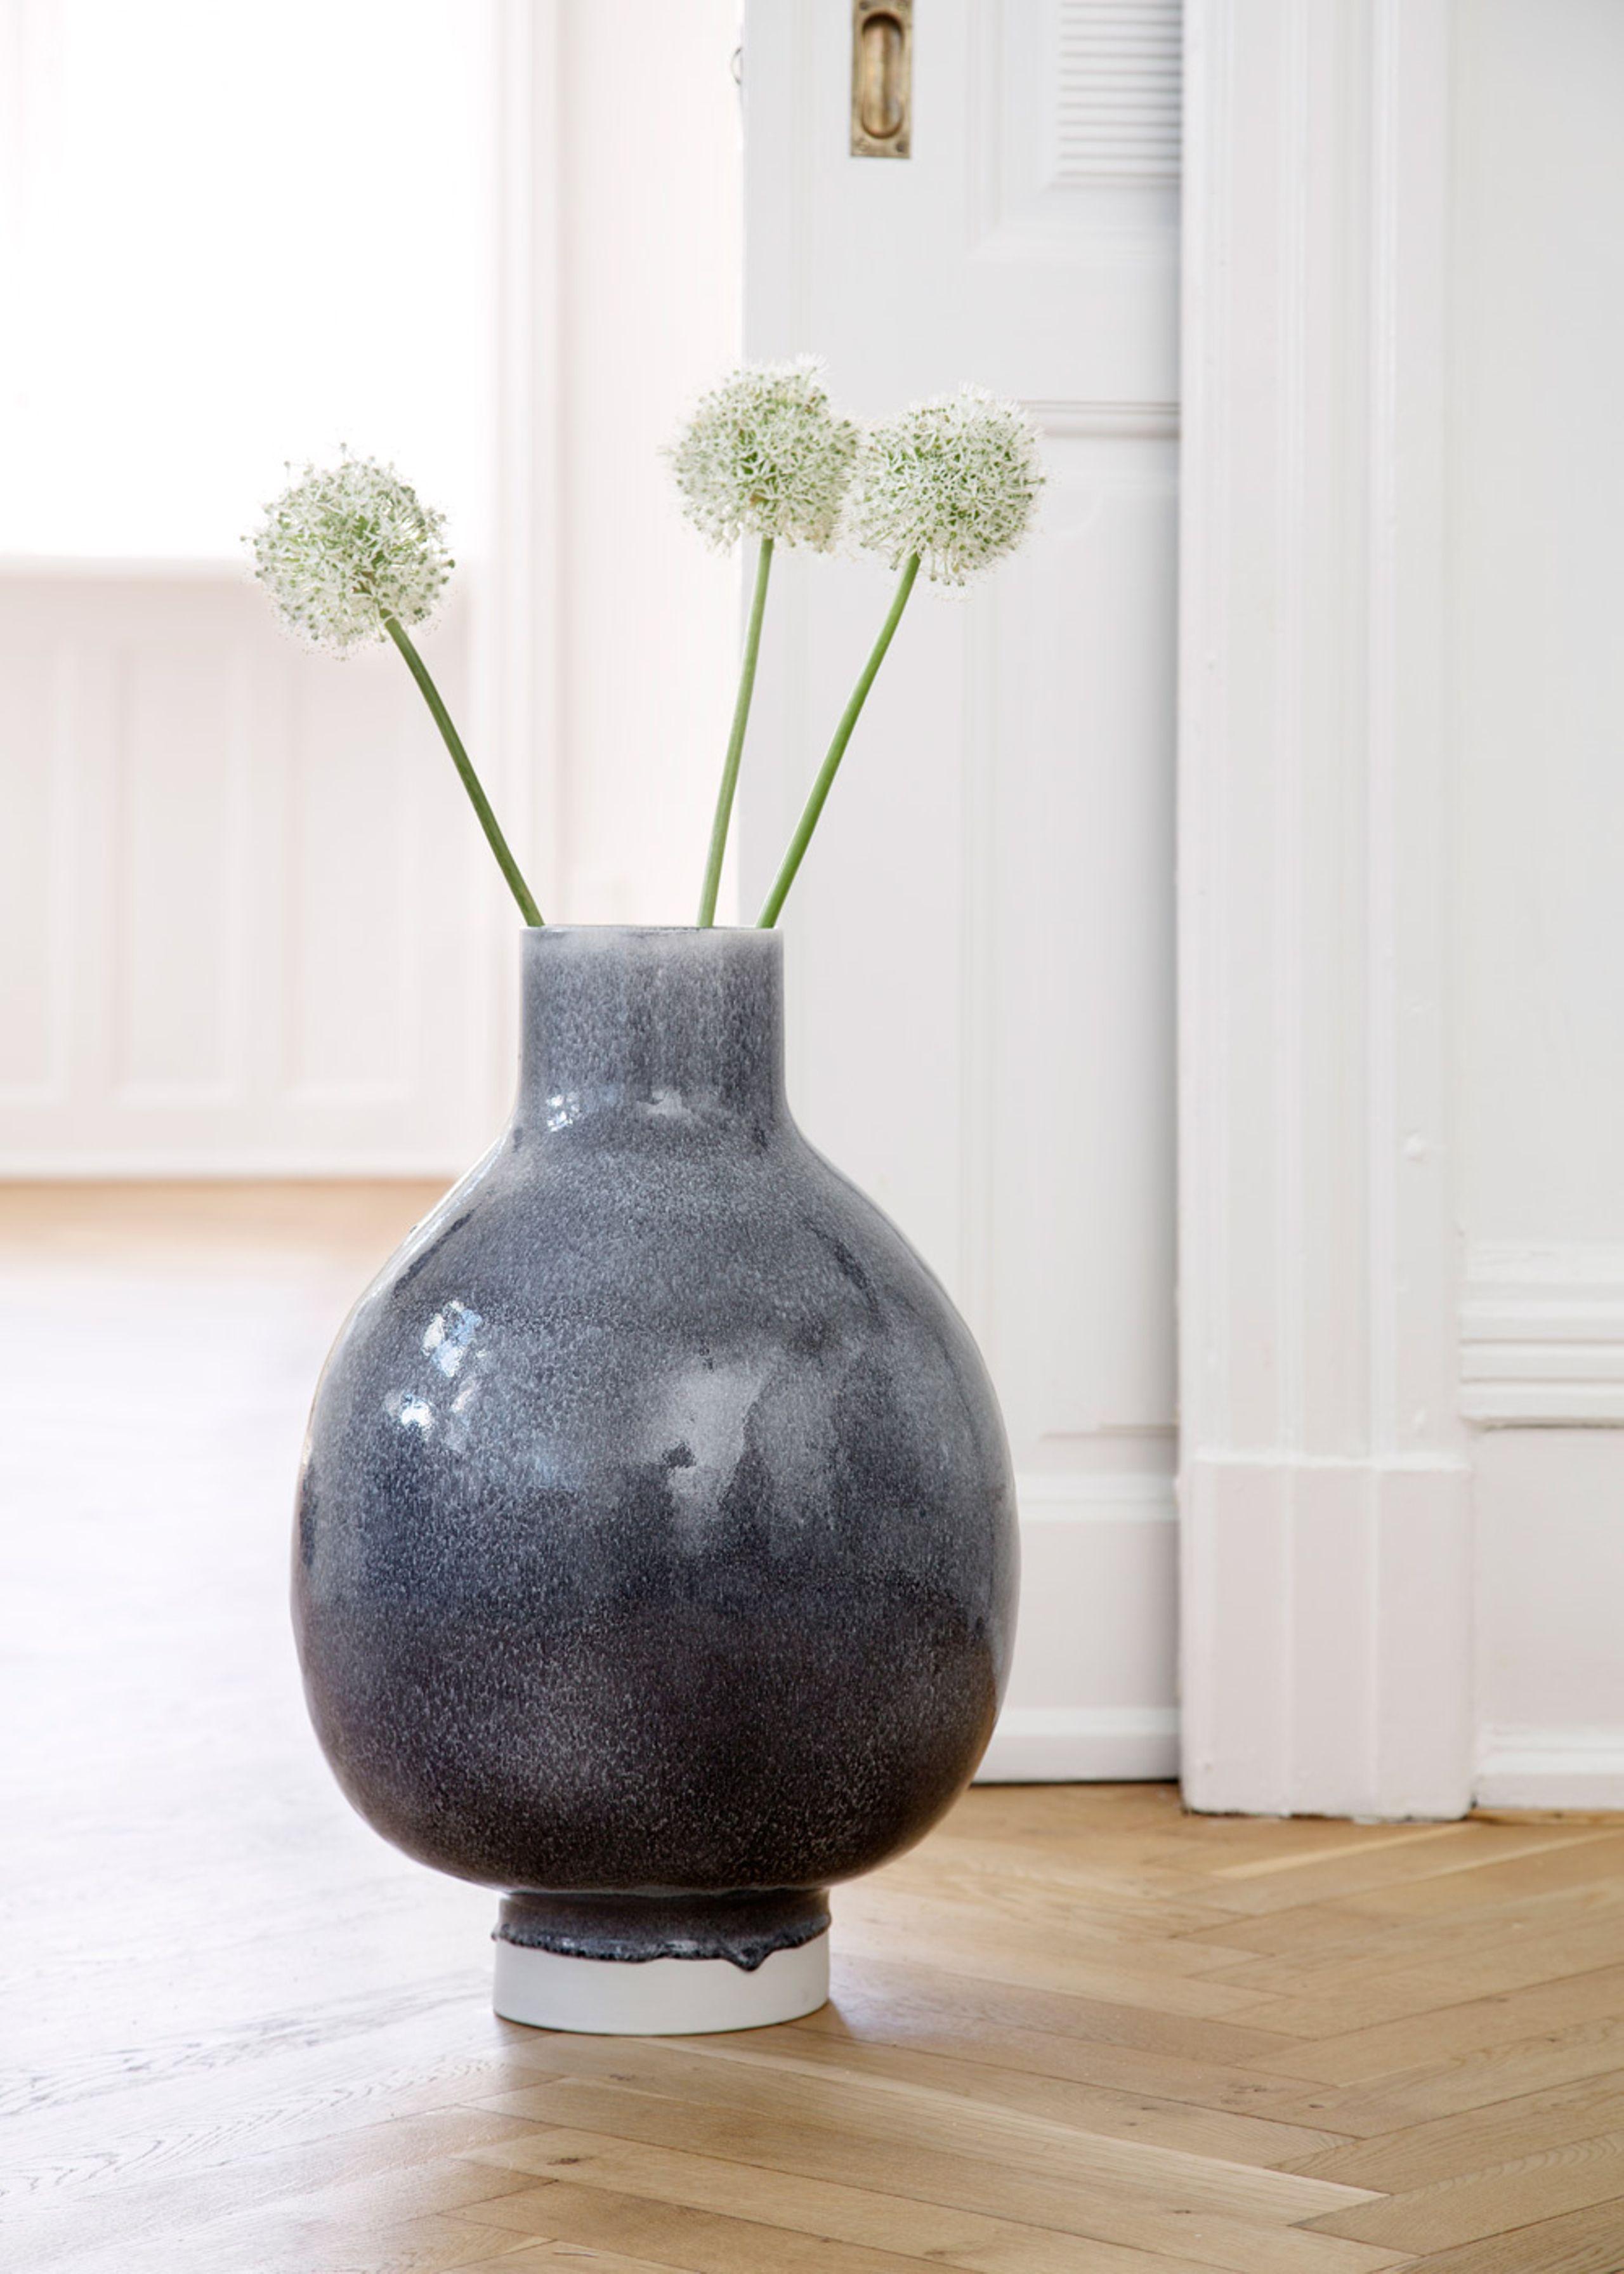 kähler gulvvase Unico Gulvvase   Vase   Kähler kähler gulvvase